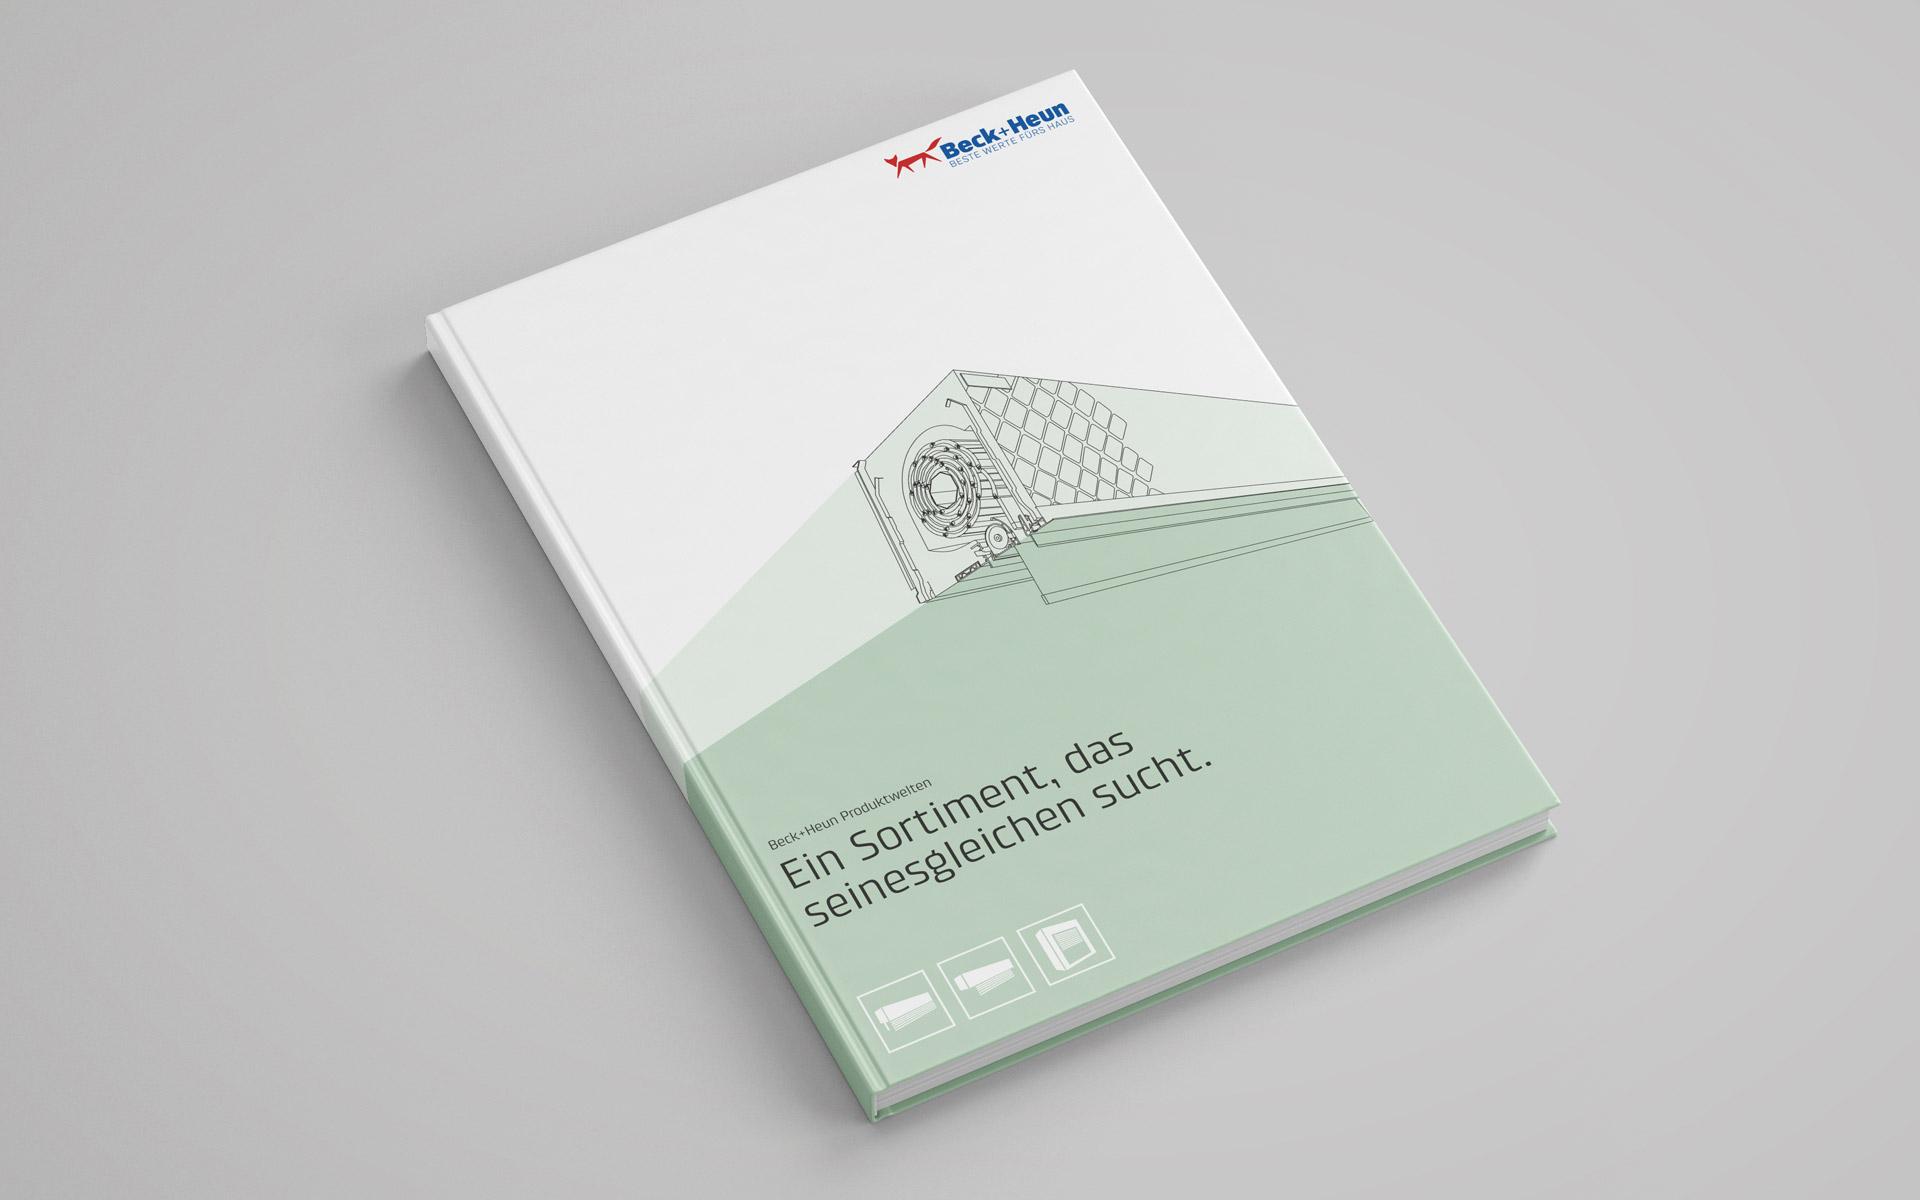 Beck+Heun Corporate Design, Markenkommunikation, Kataloggestaltung, Titel